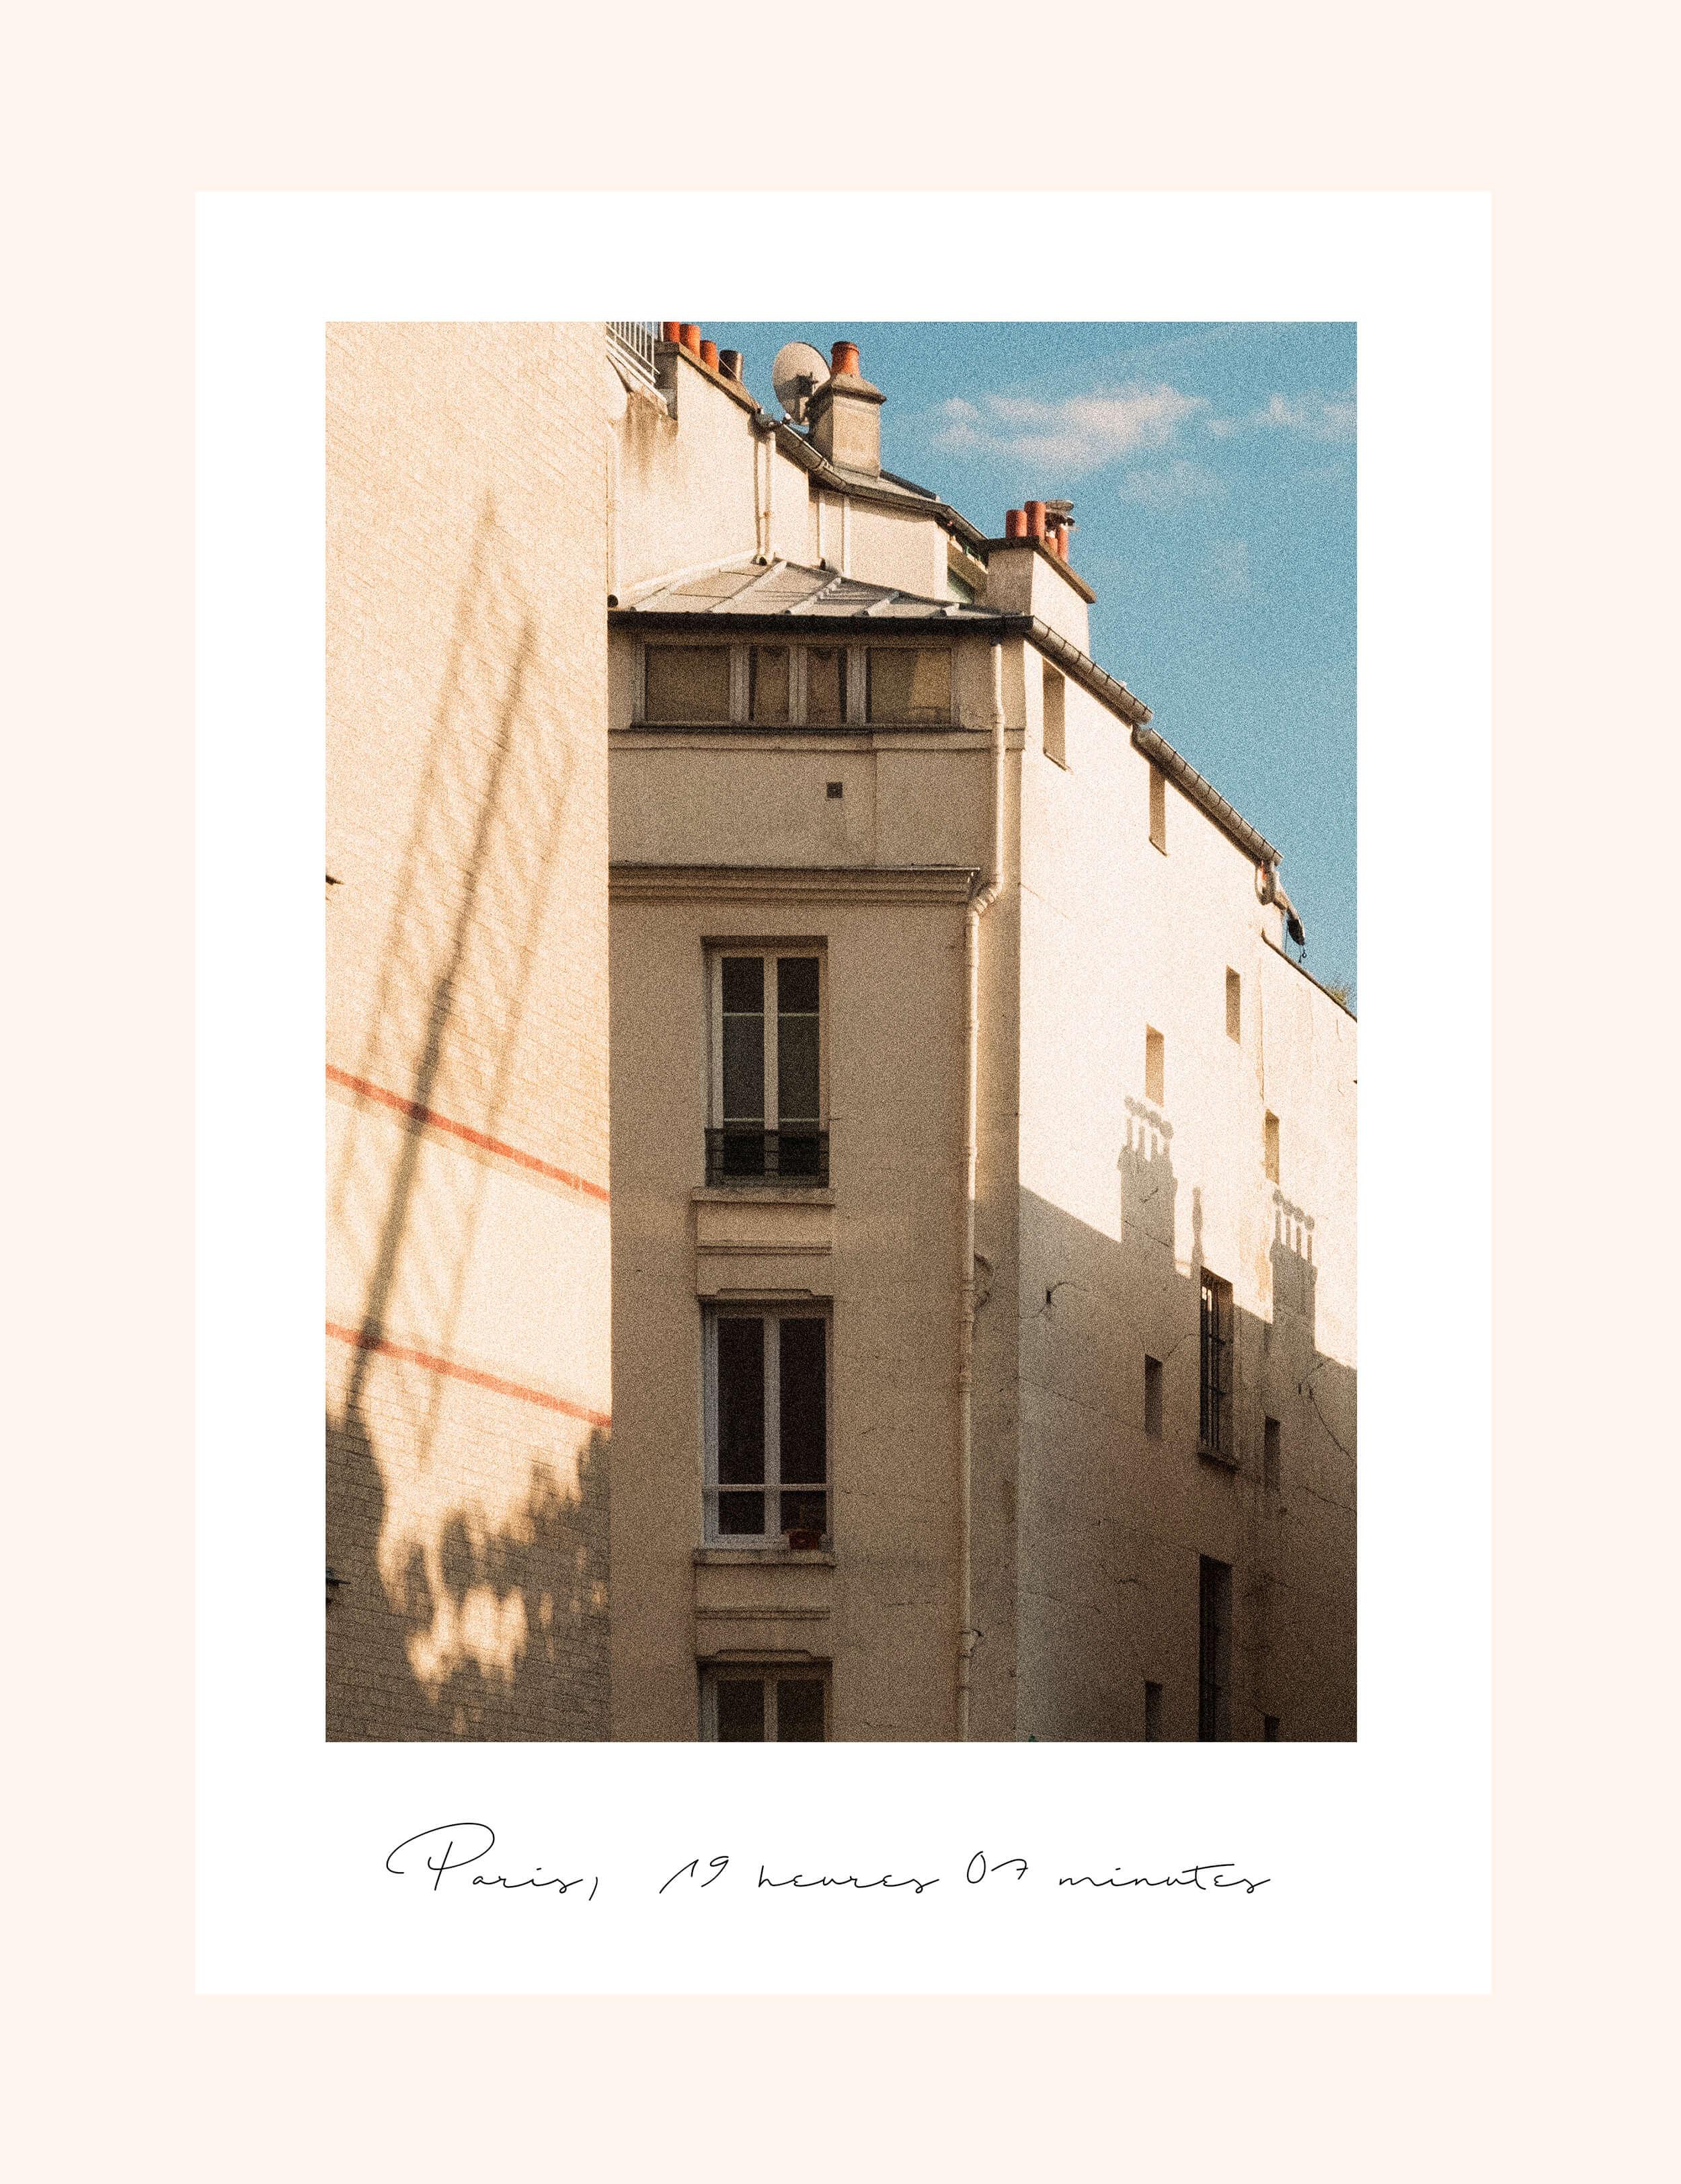 Paris, with love - 01